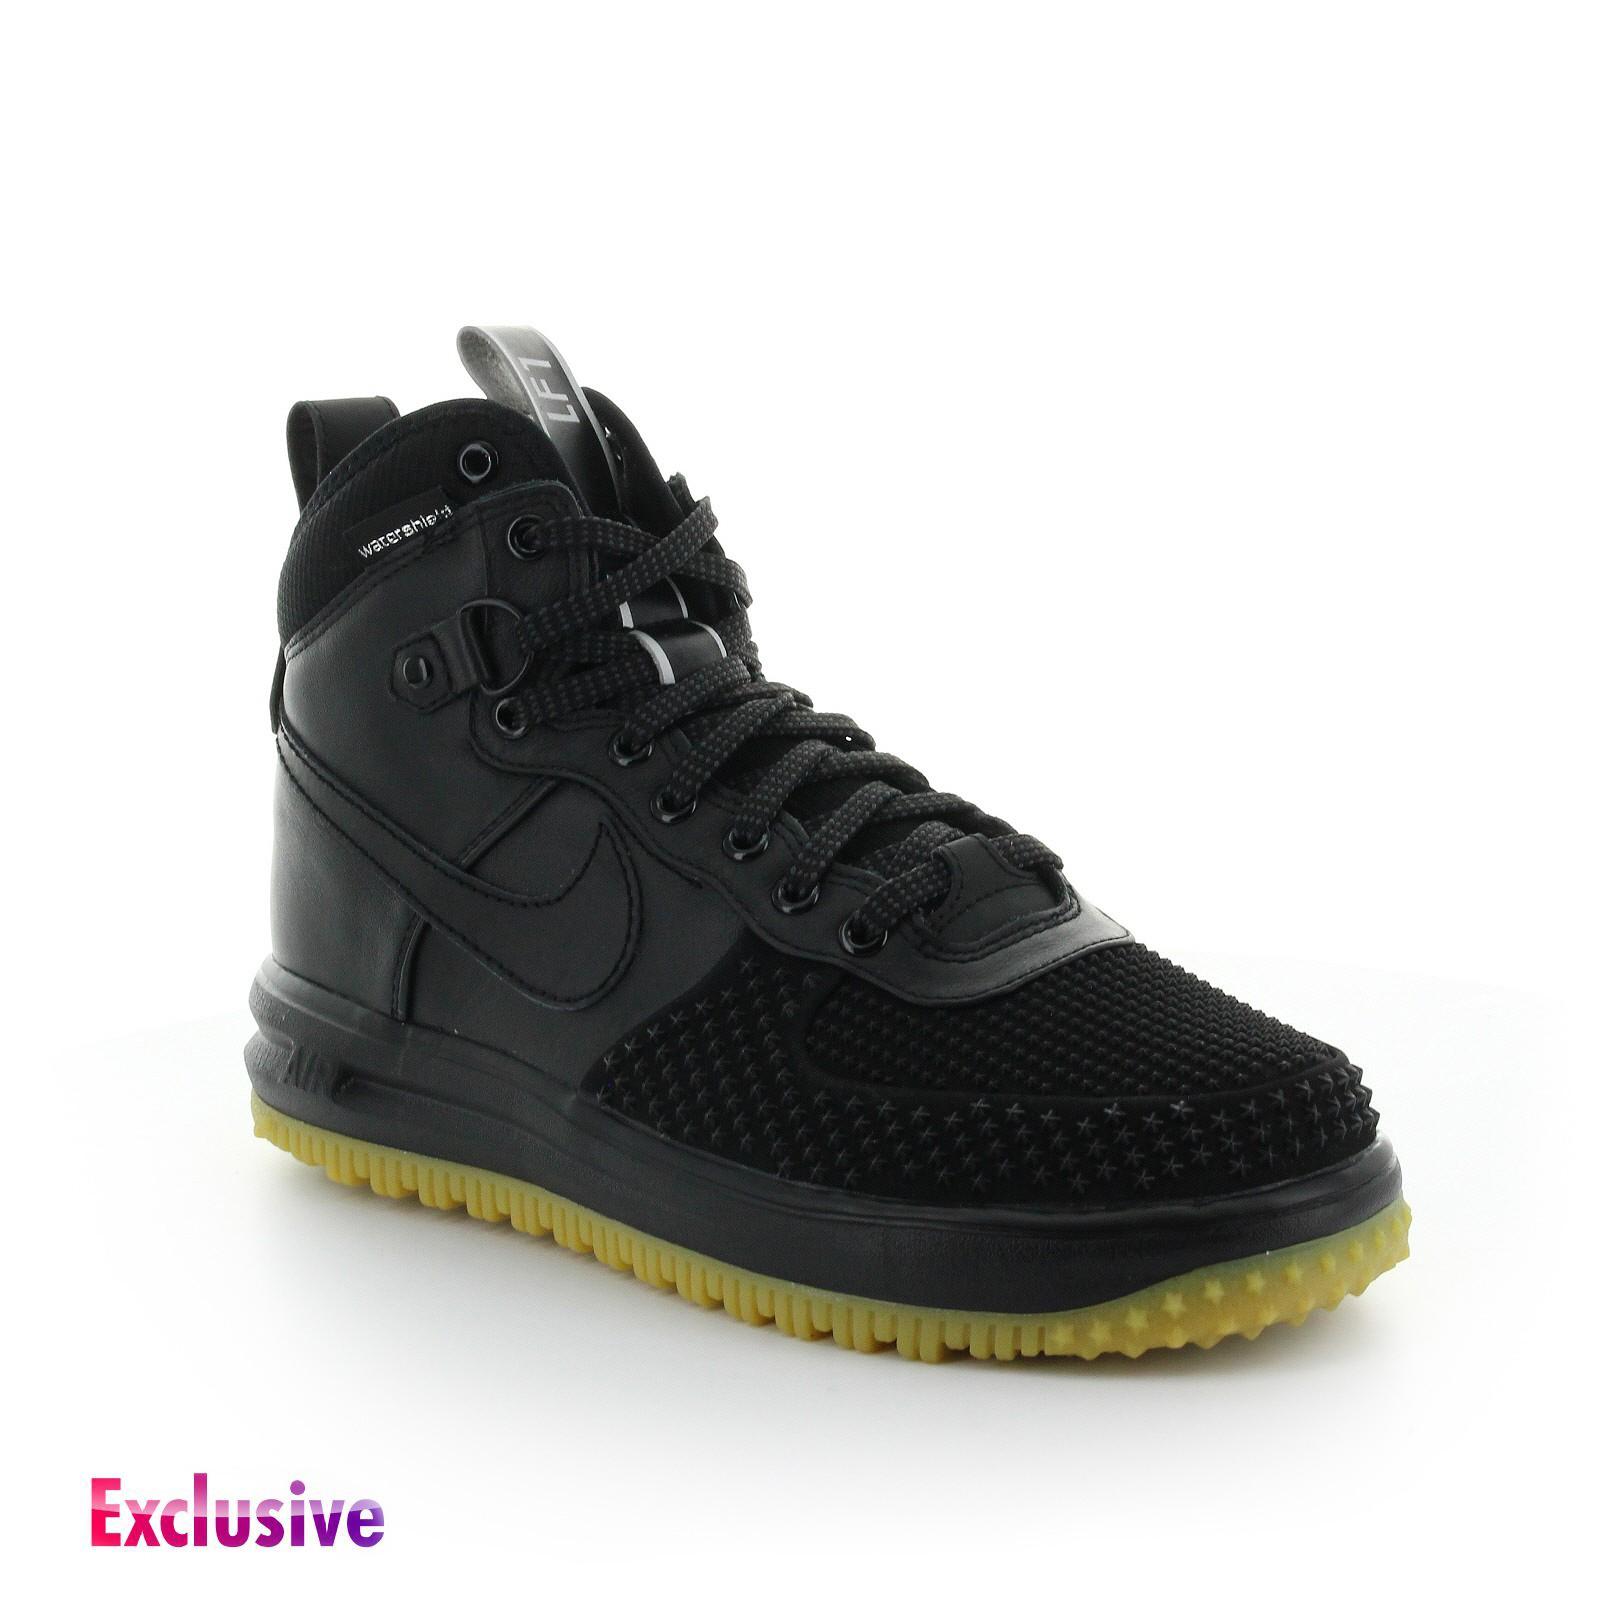 sale retailer aa382 663cf ... lunar force 1 duckboot Nike ...